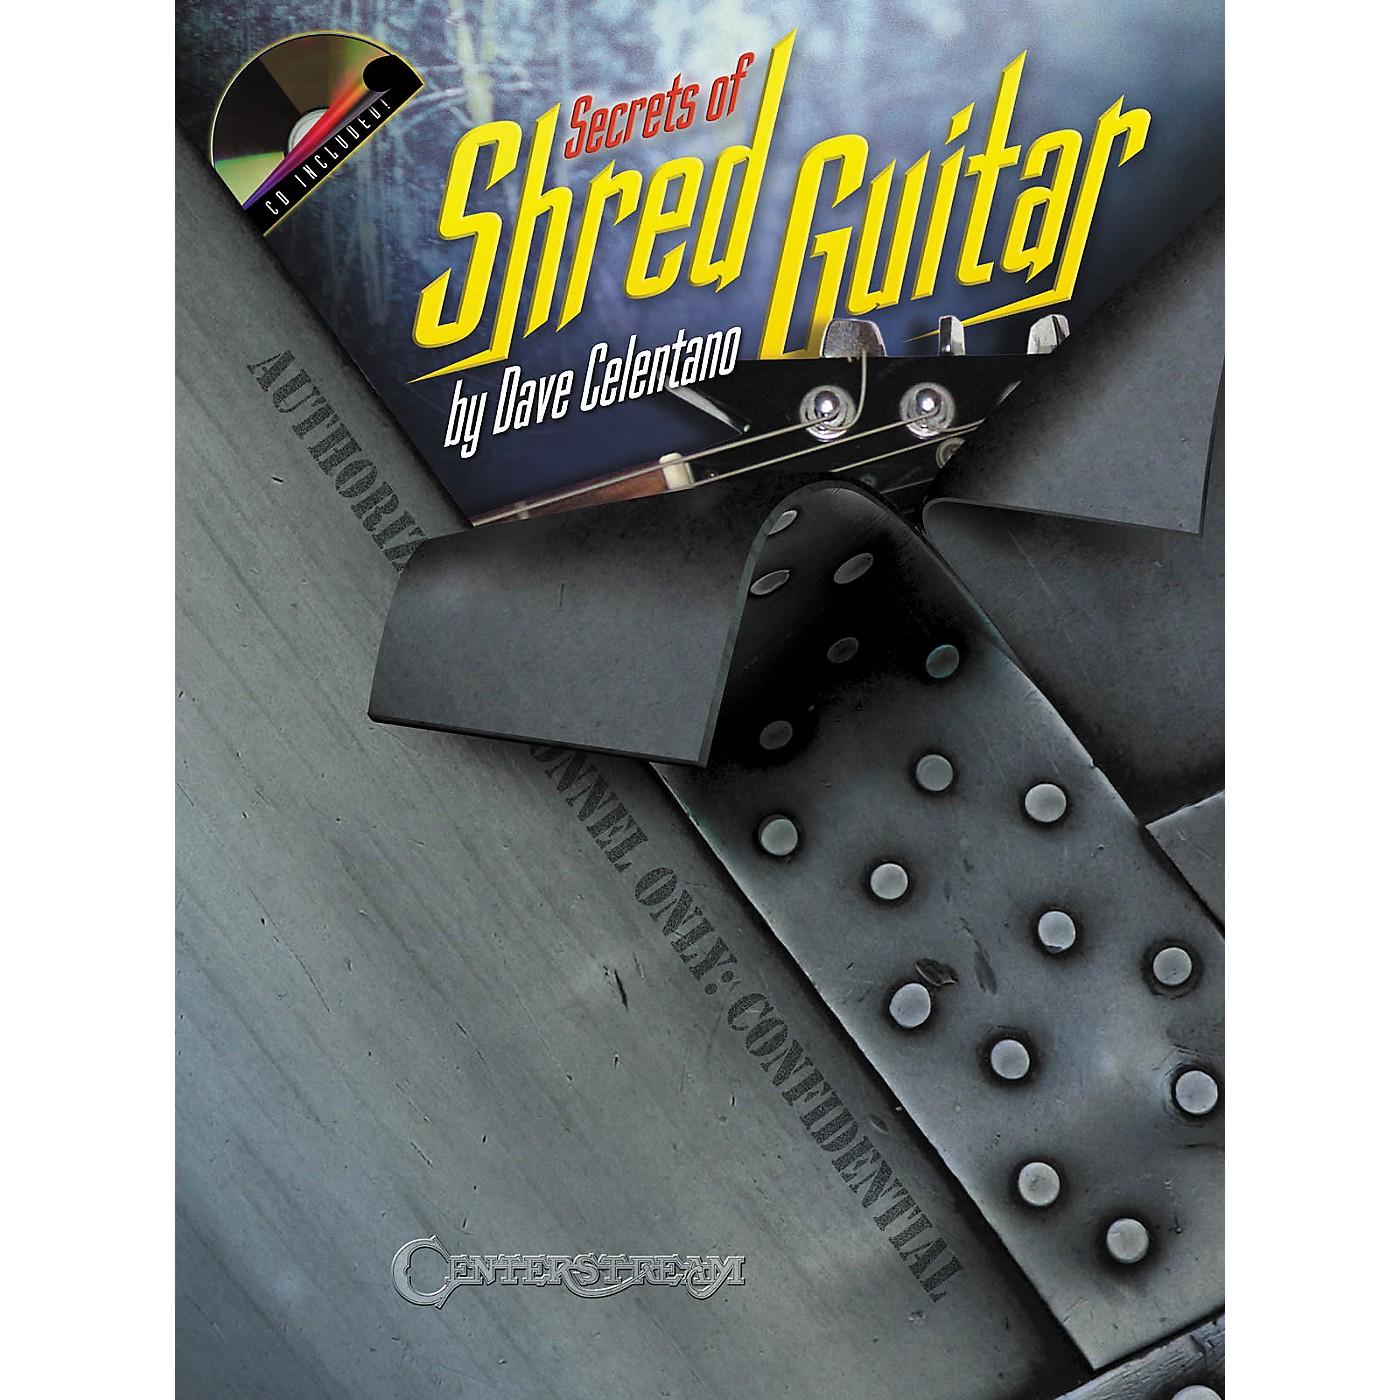 Hal Leonard Secrets of Shred Guitar Book and CD thumbnail